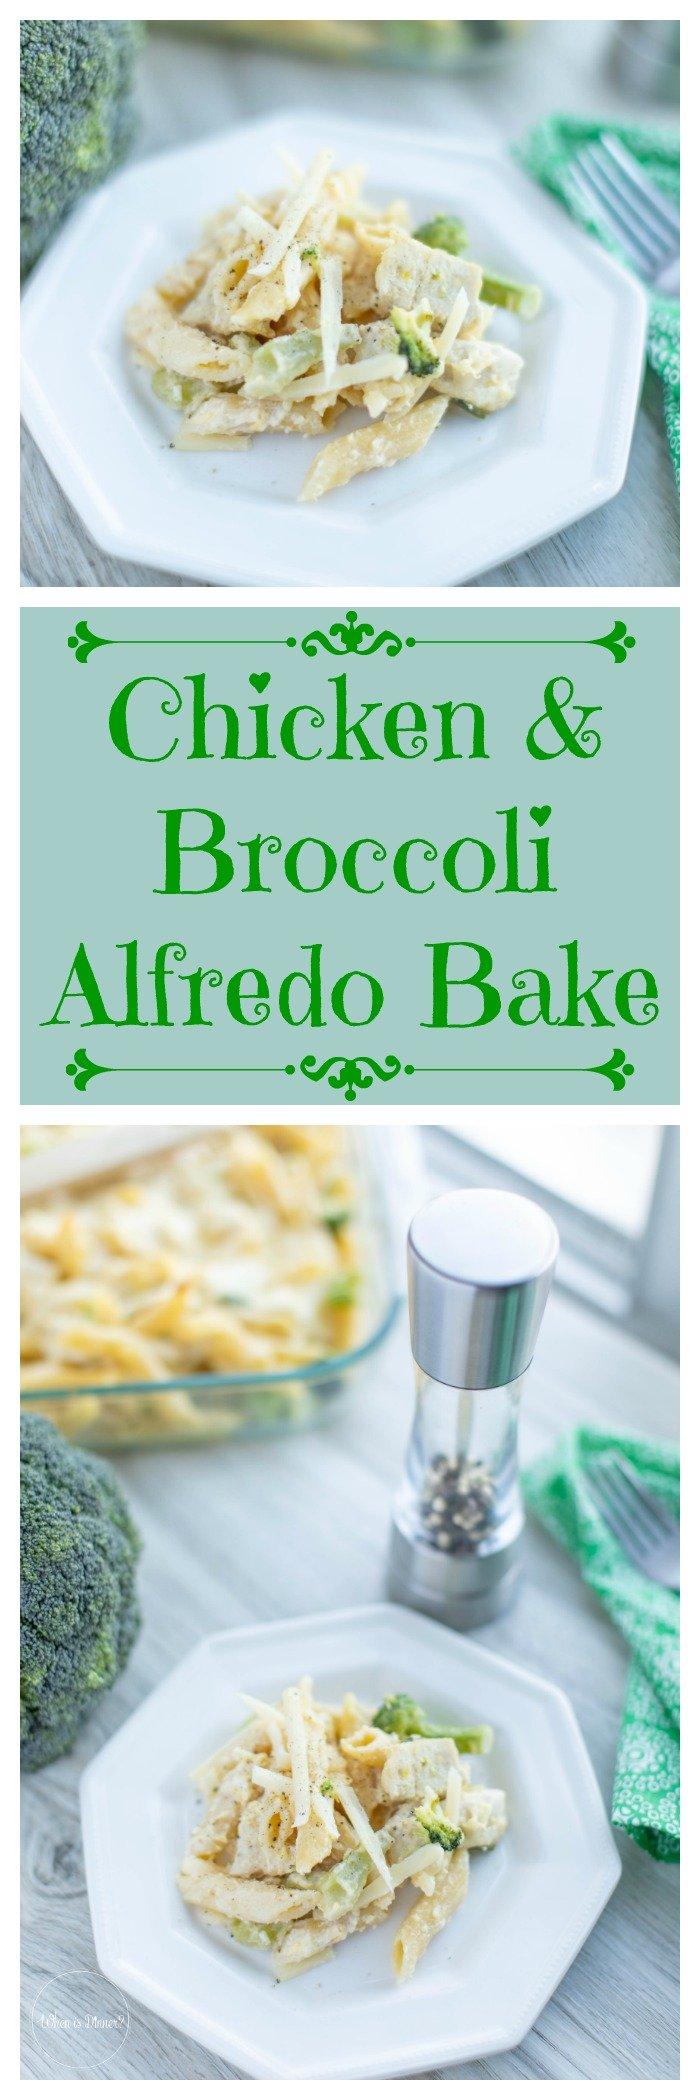 Chicken and Broccoli Alfredo Bake